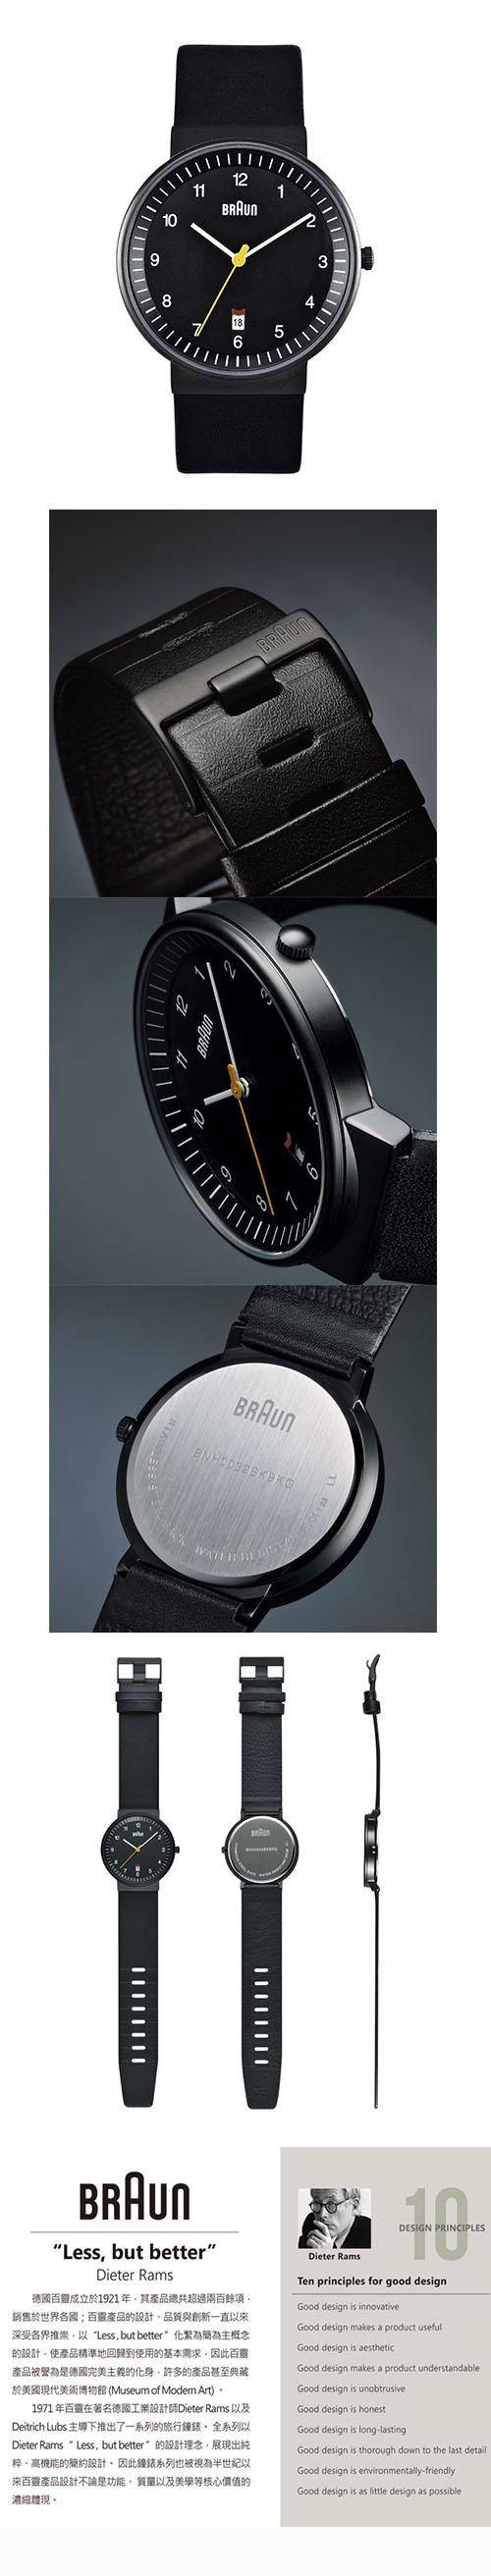 BRAUN 日期顯示 男款石英錶 BN0032 黑